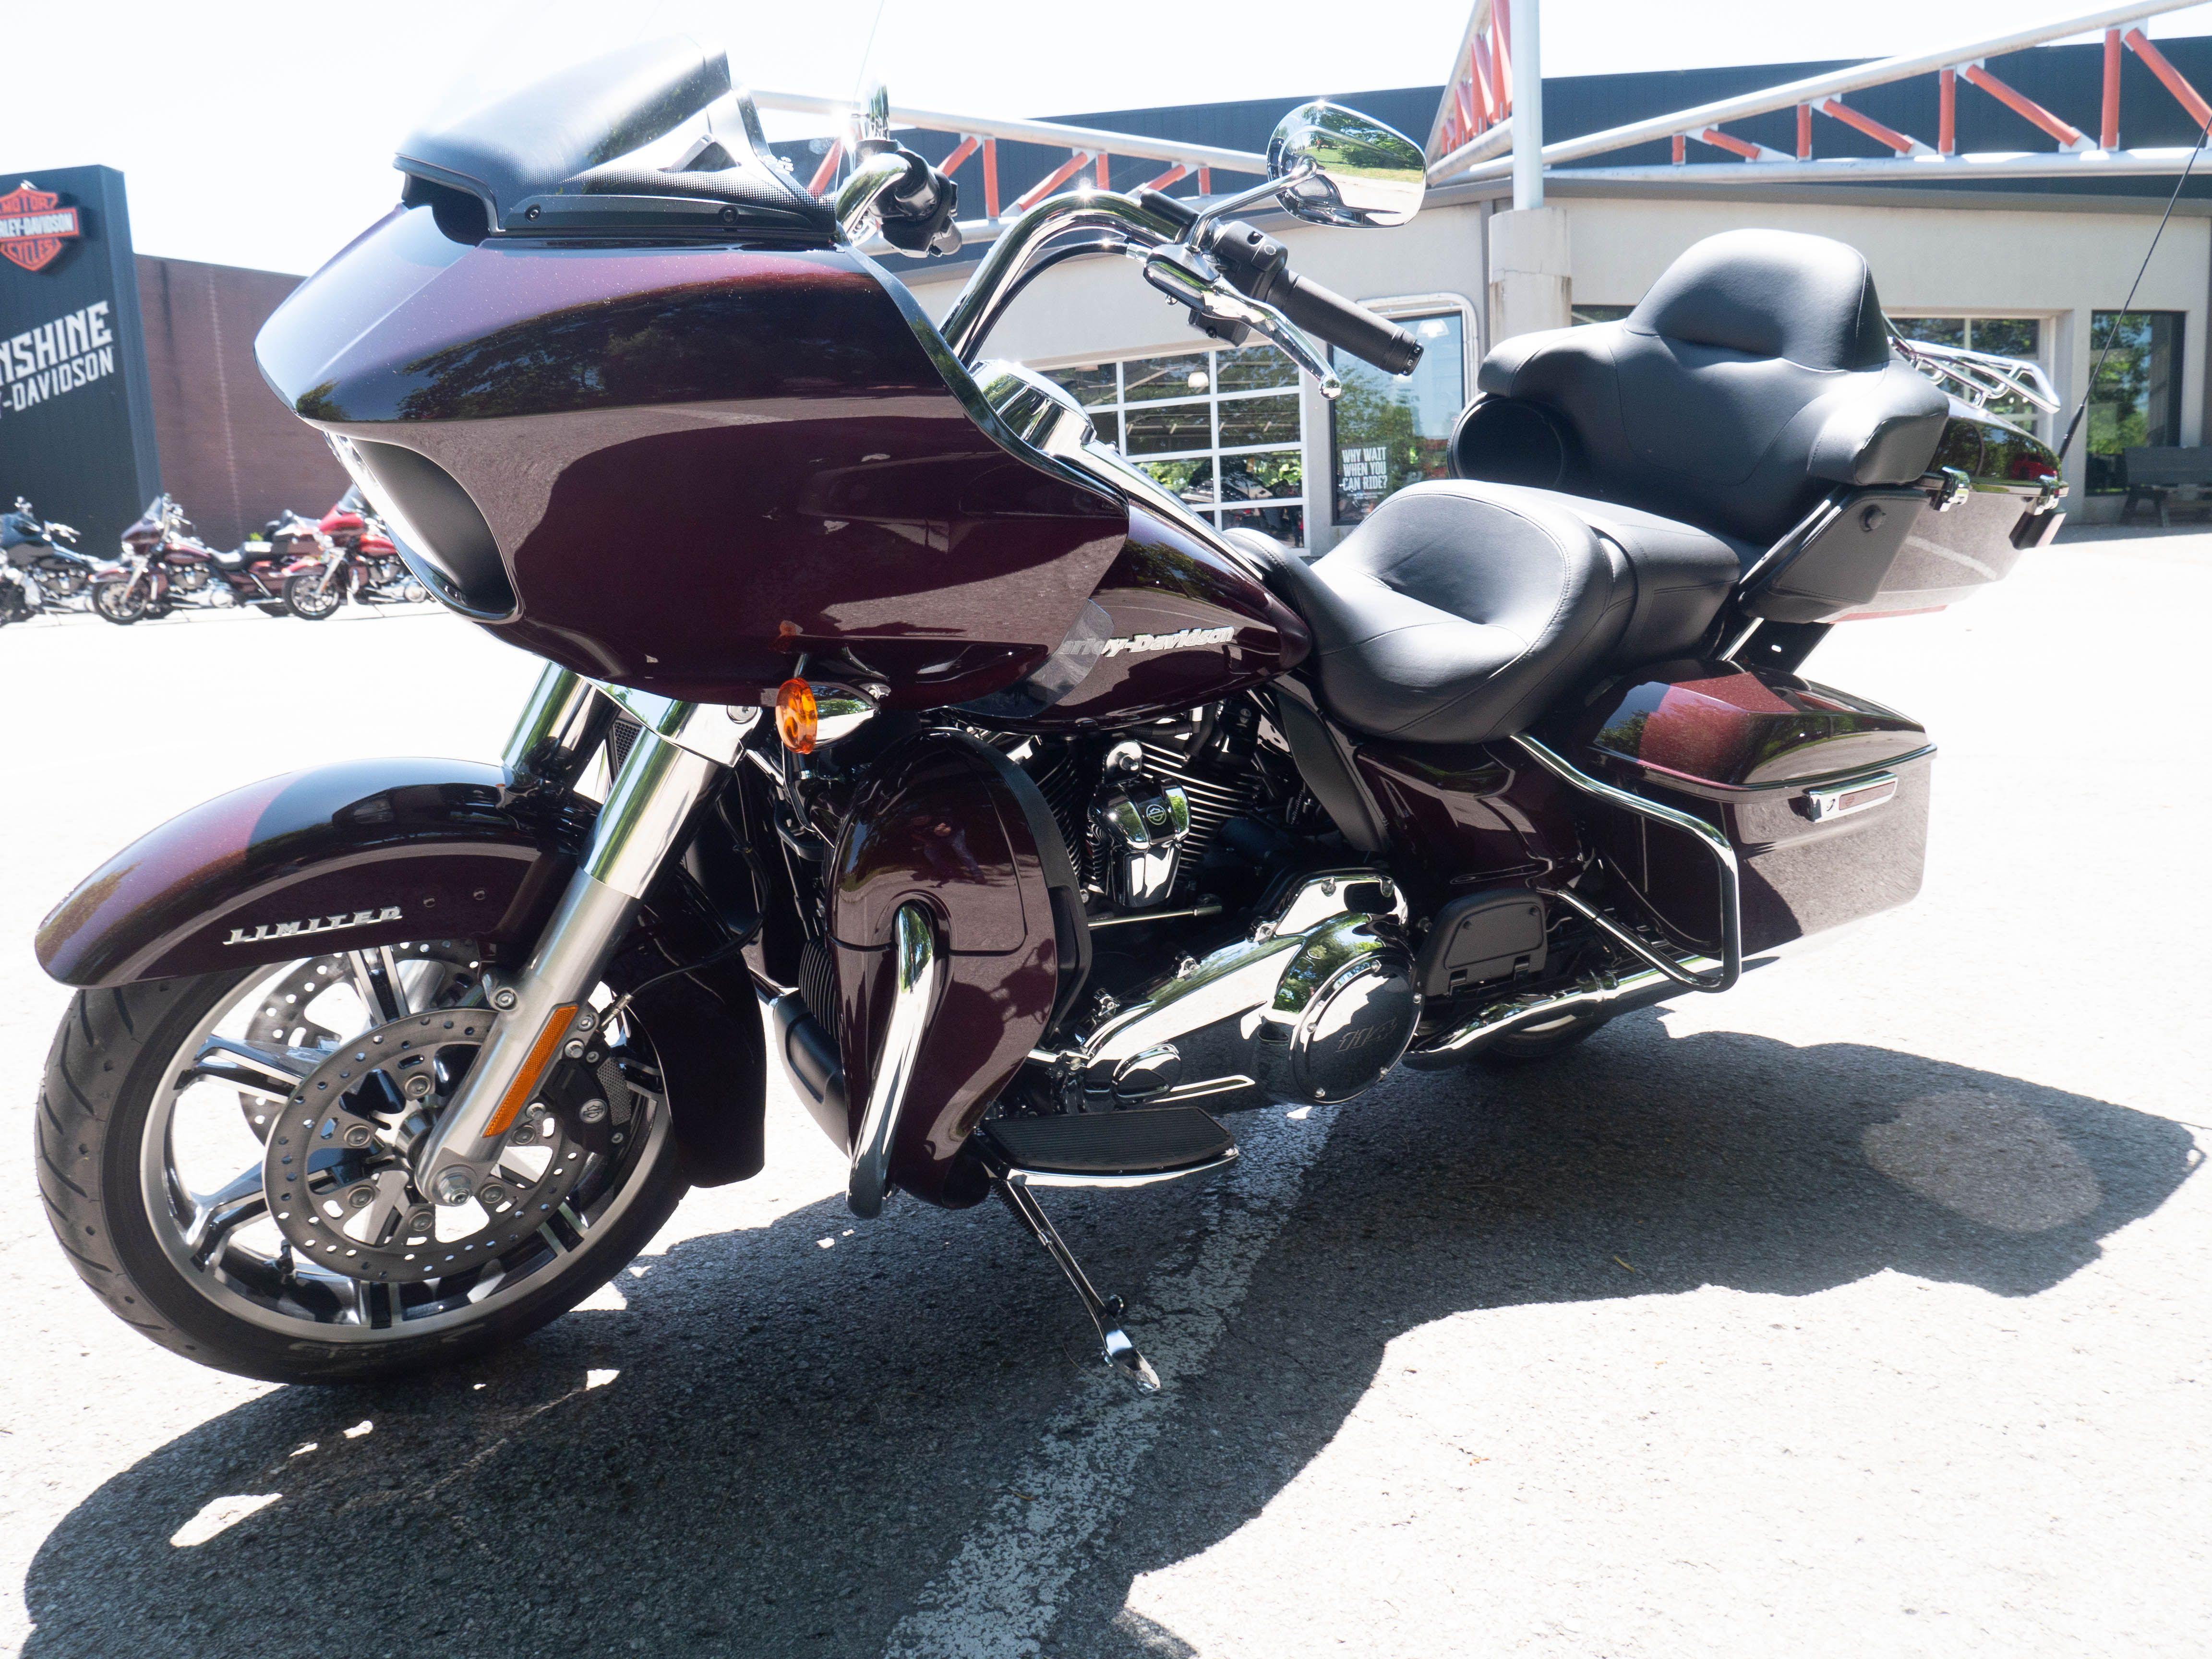 New 2021 Harley-Davidson Road Glide Limited